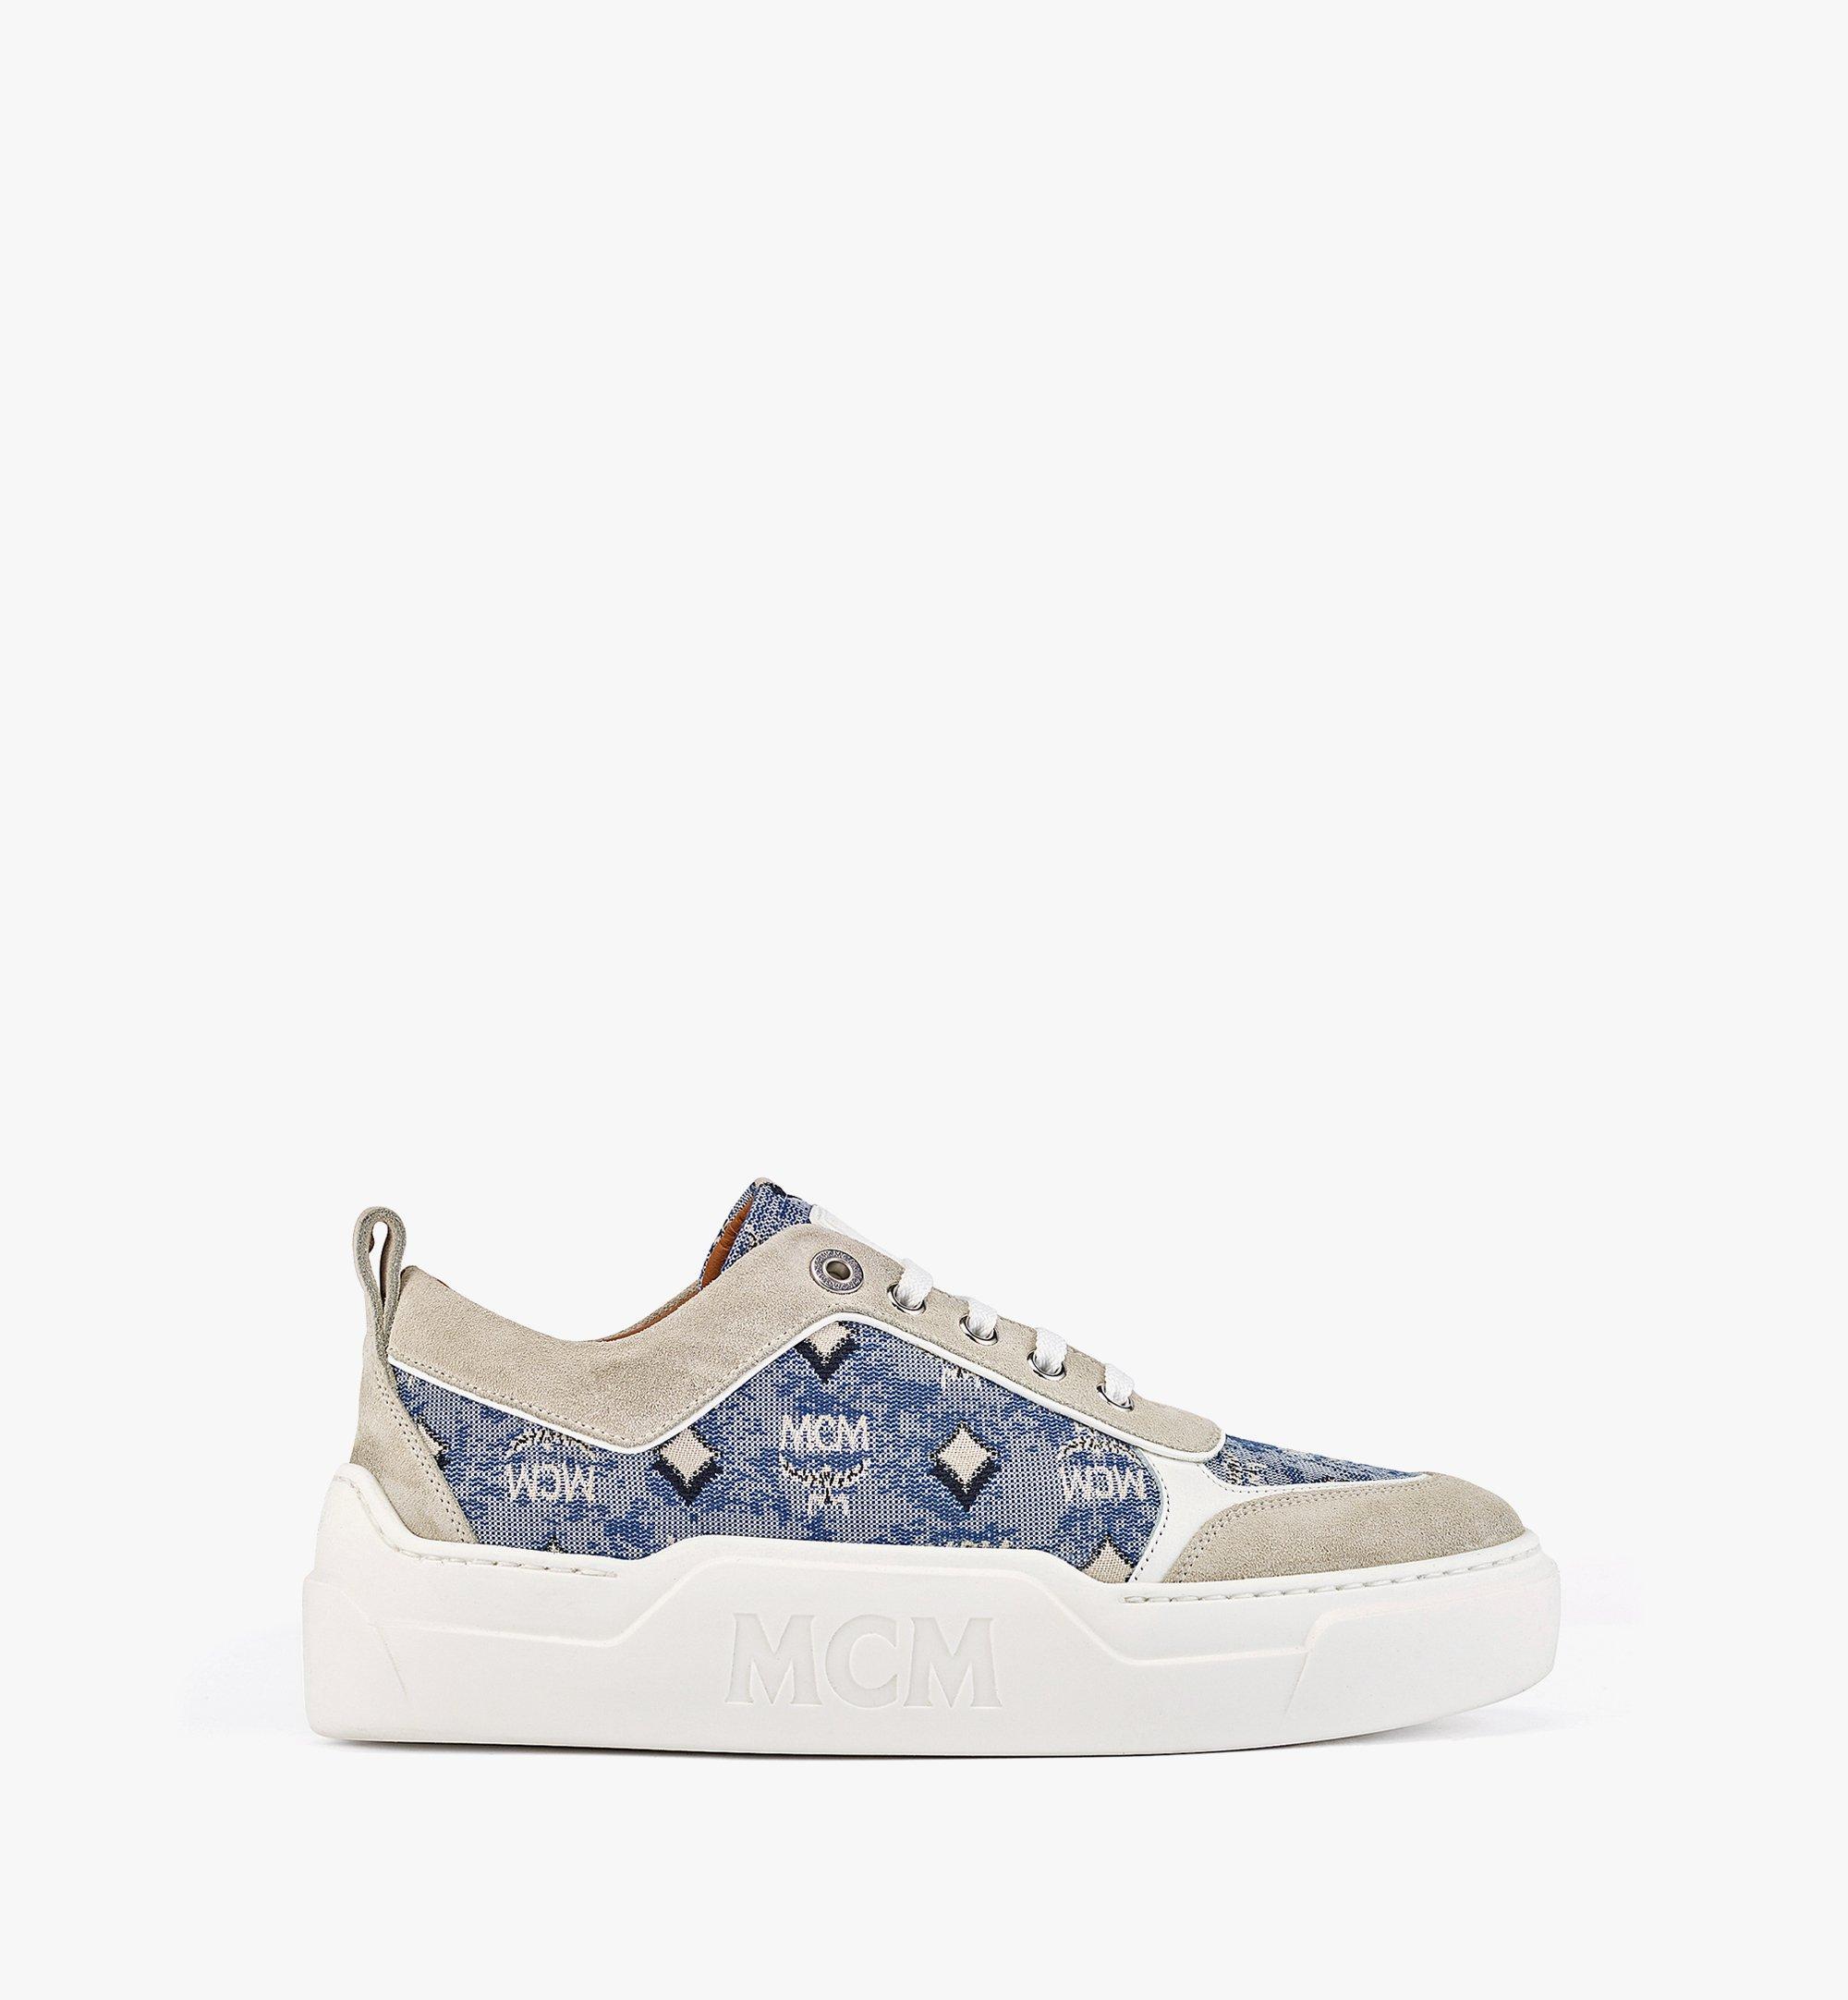 MCM Women's Skyward Platform Sneakers in Vintage Jacquard Monogram Blue MESBATQ03LU037 Alternate View 3